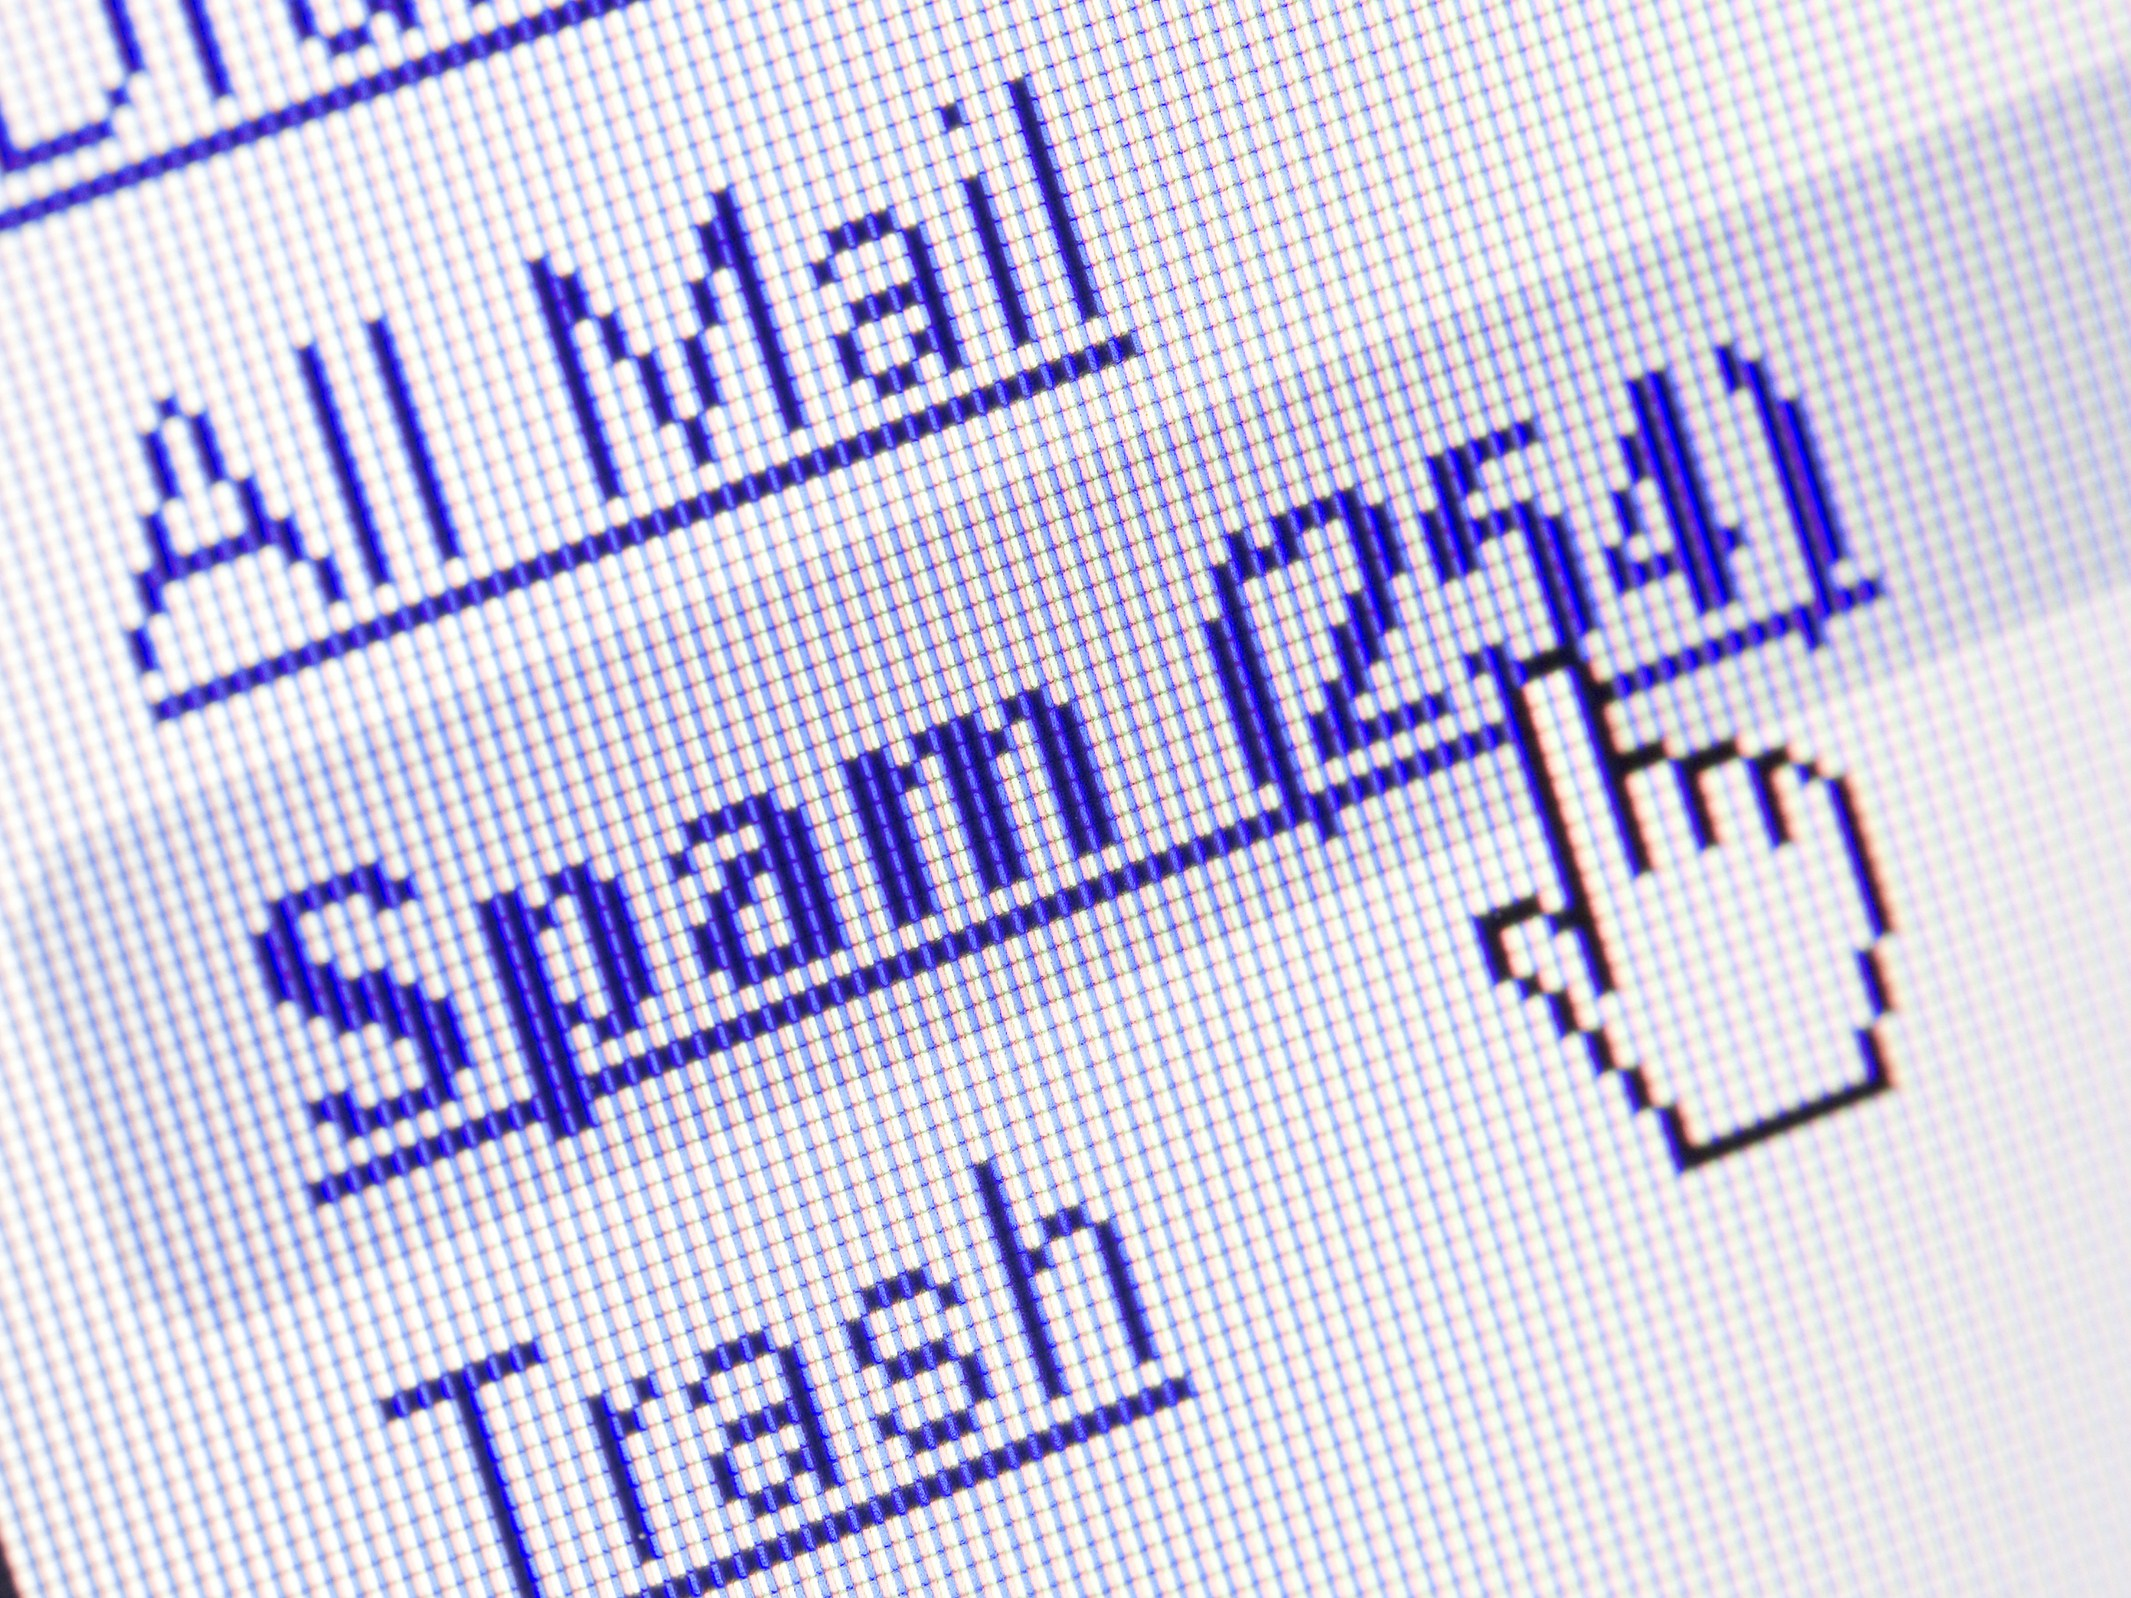 ABŞ spam payına görə liderdir